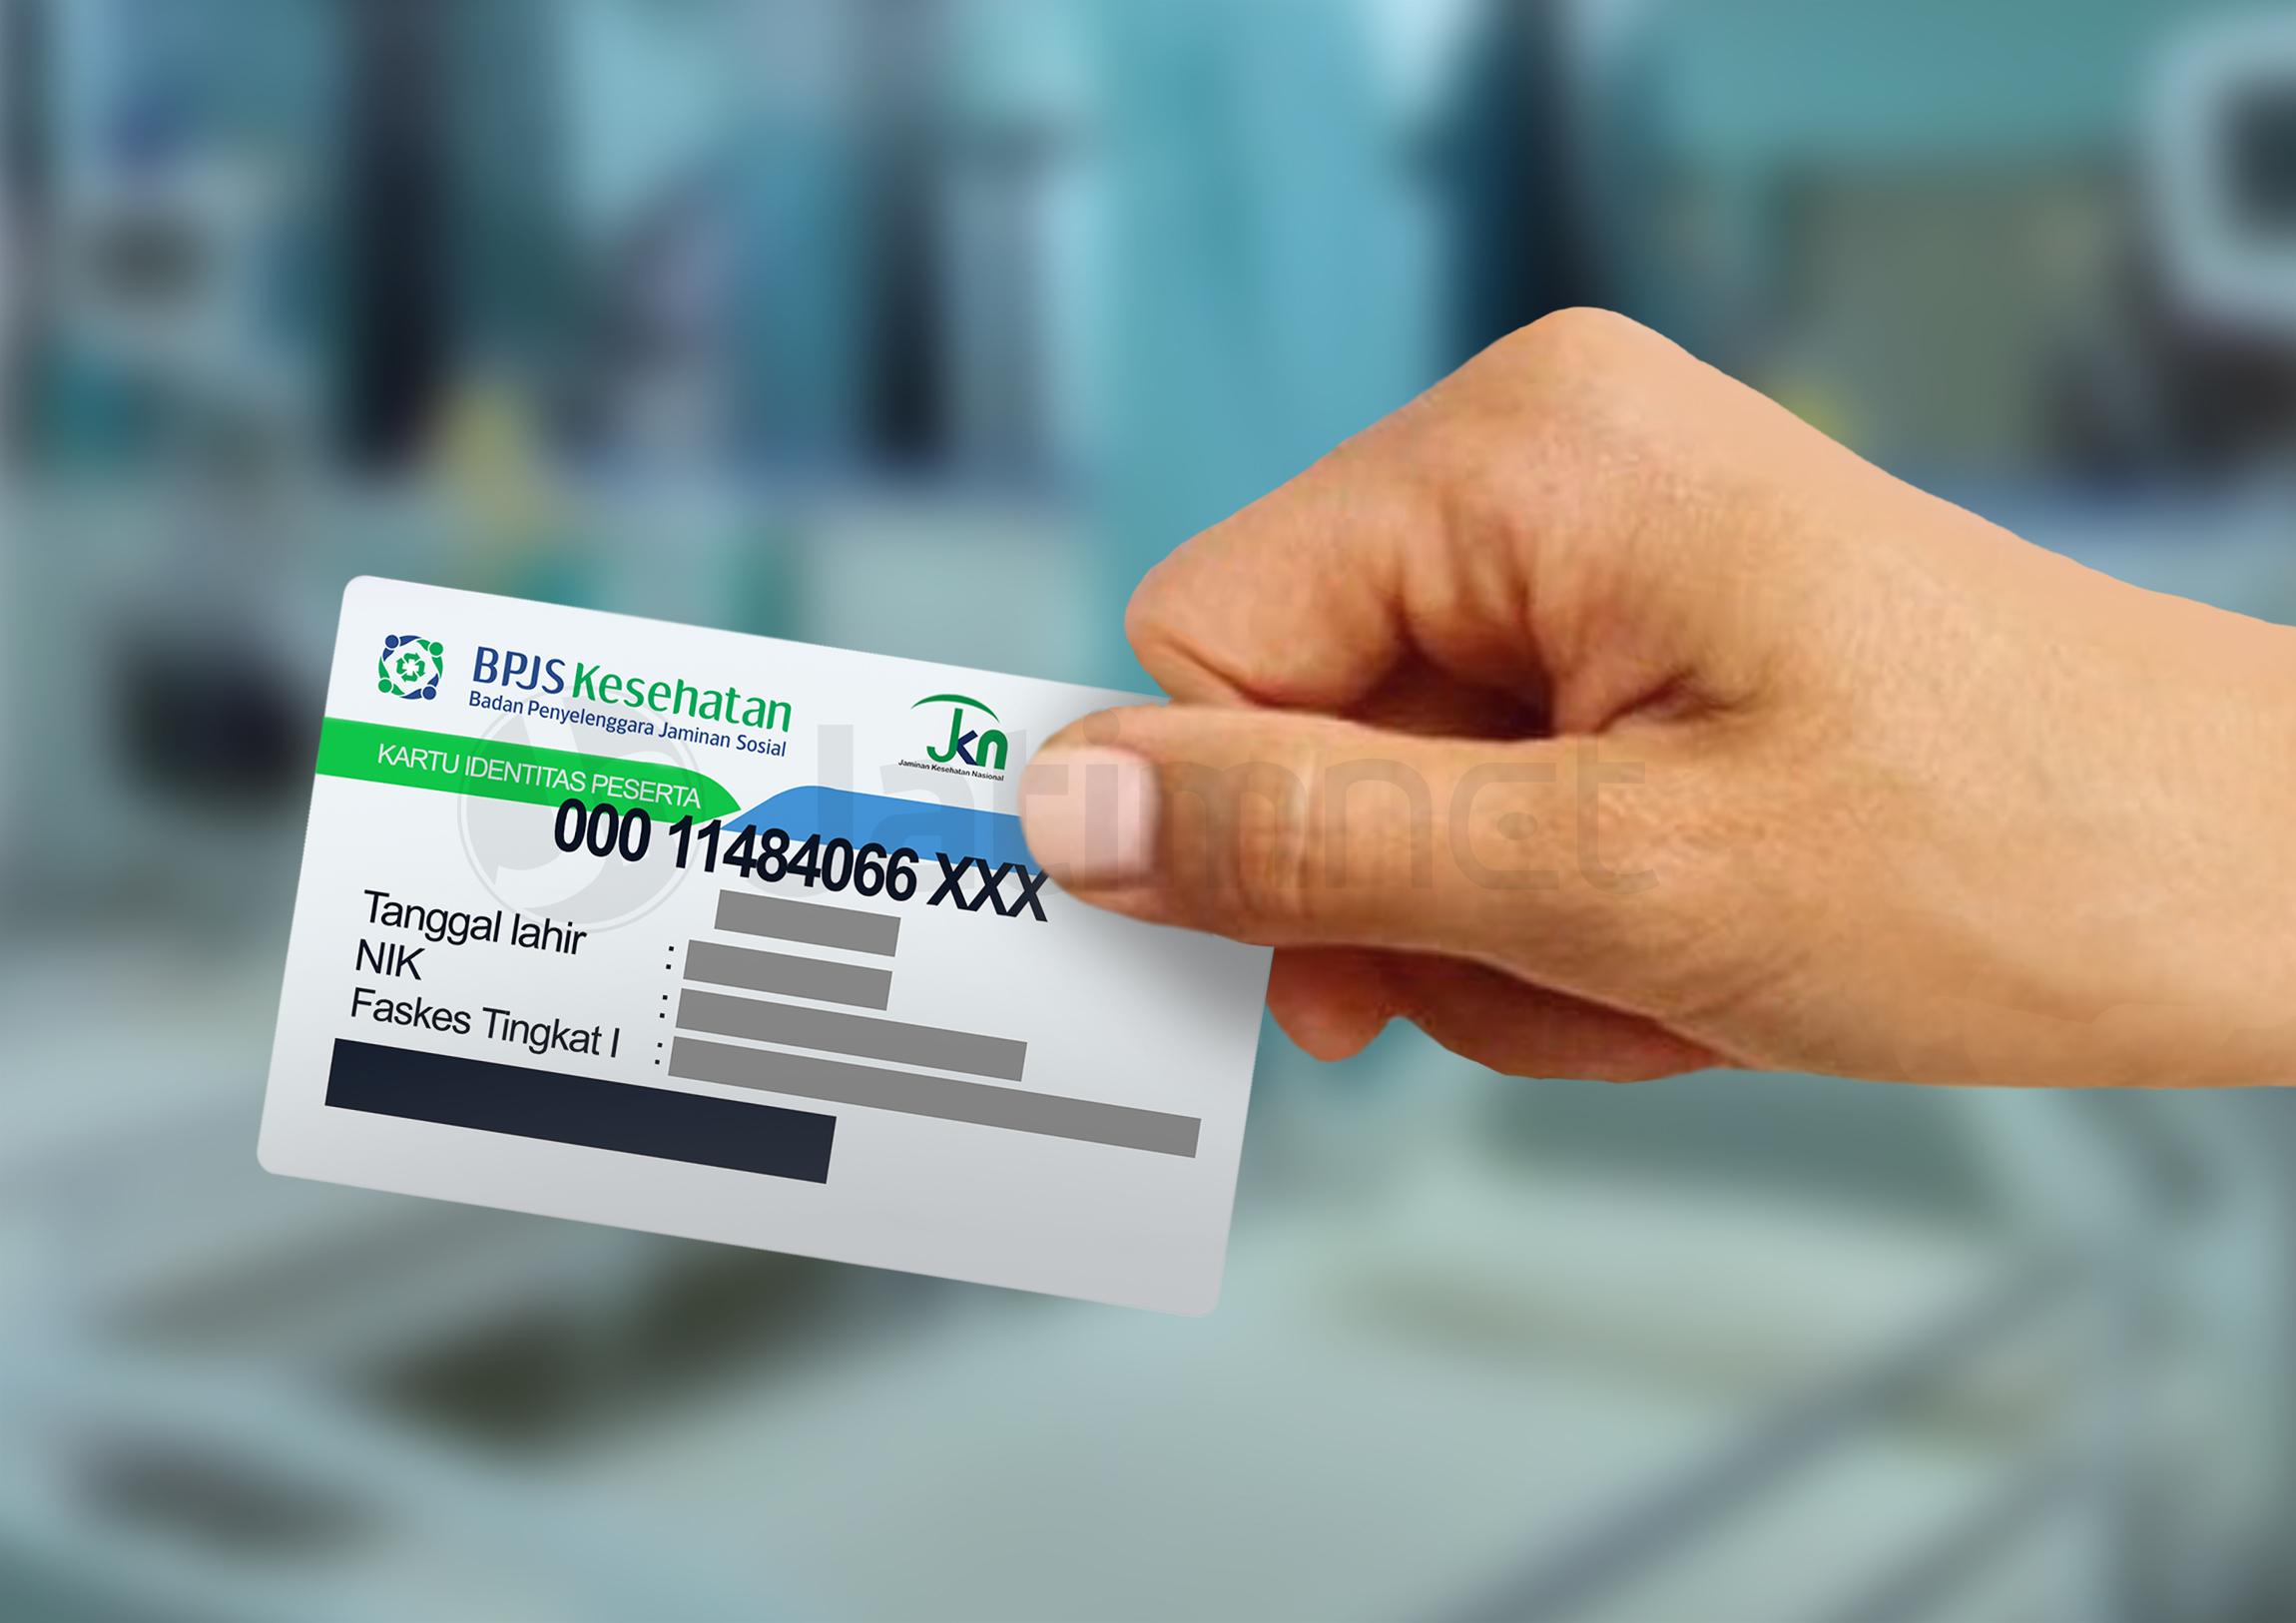 RSUD Dr Soetomo Usulkan BPJS Kerjasama dengan Bank